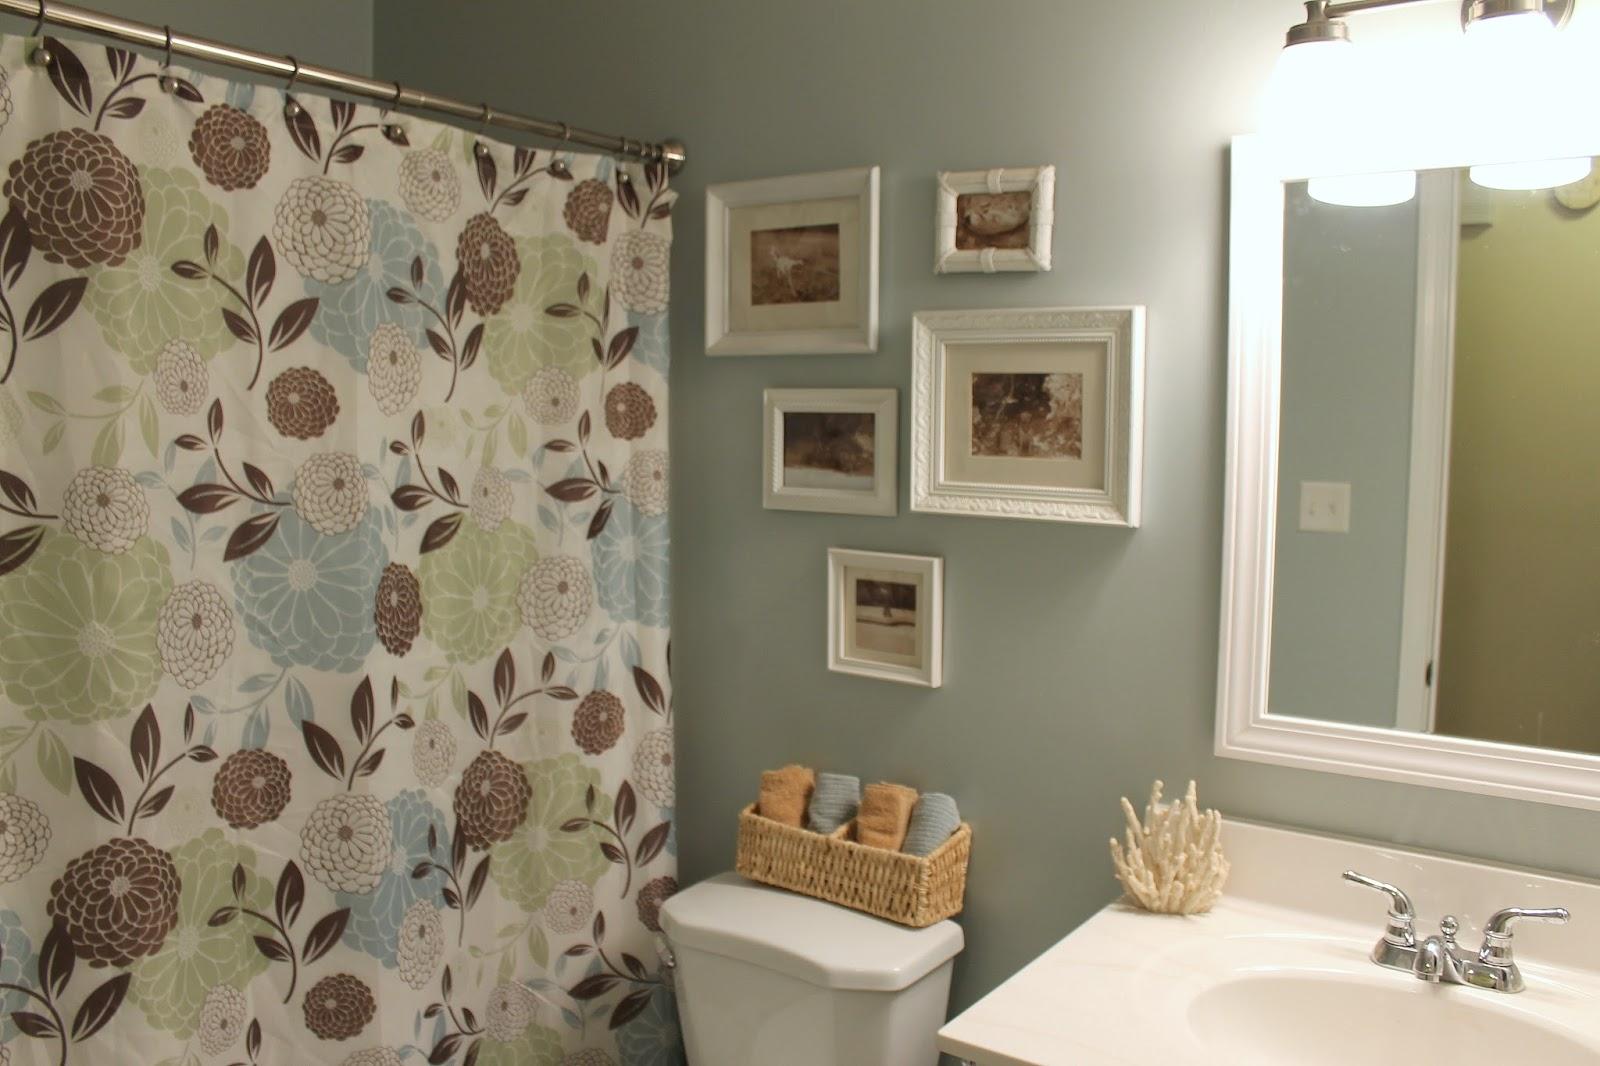 Sherwin Williams Rainwashed Bathroom. Bathroom Upgrade Rainwashed Lightened